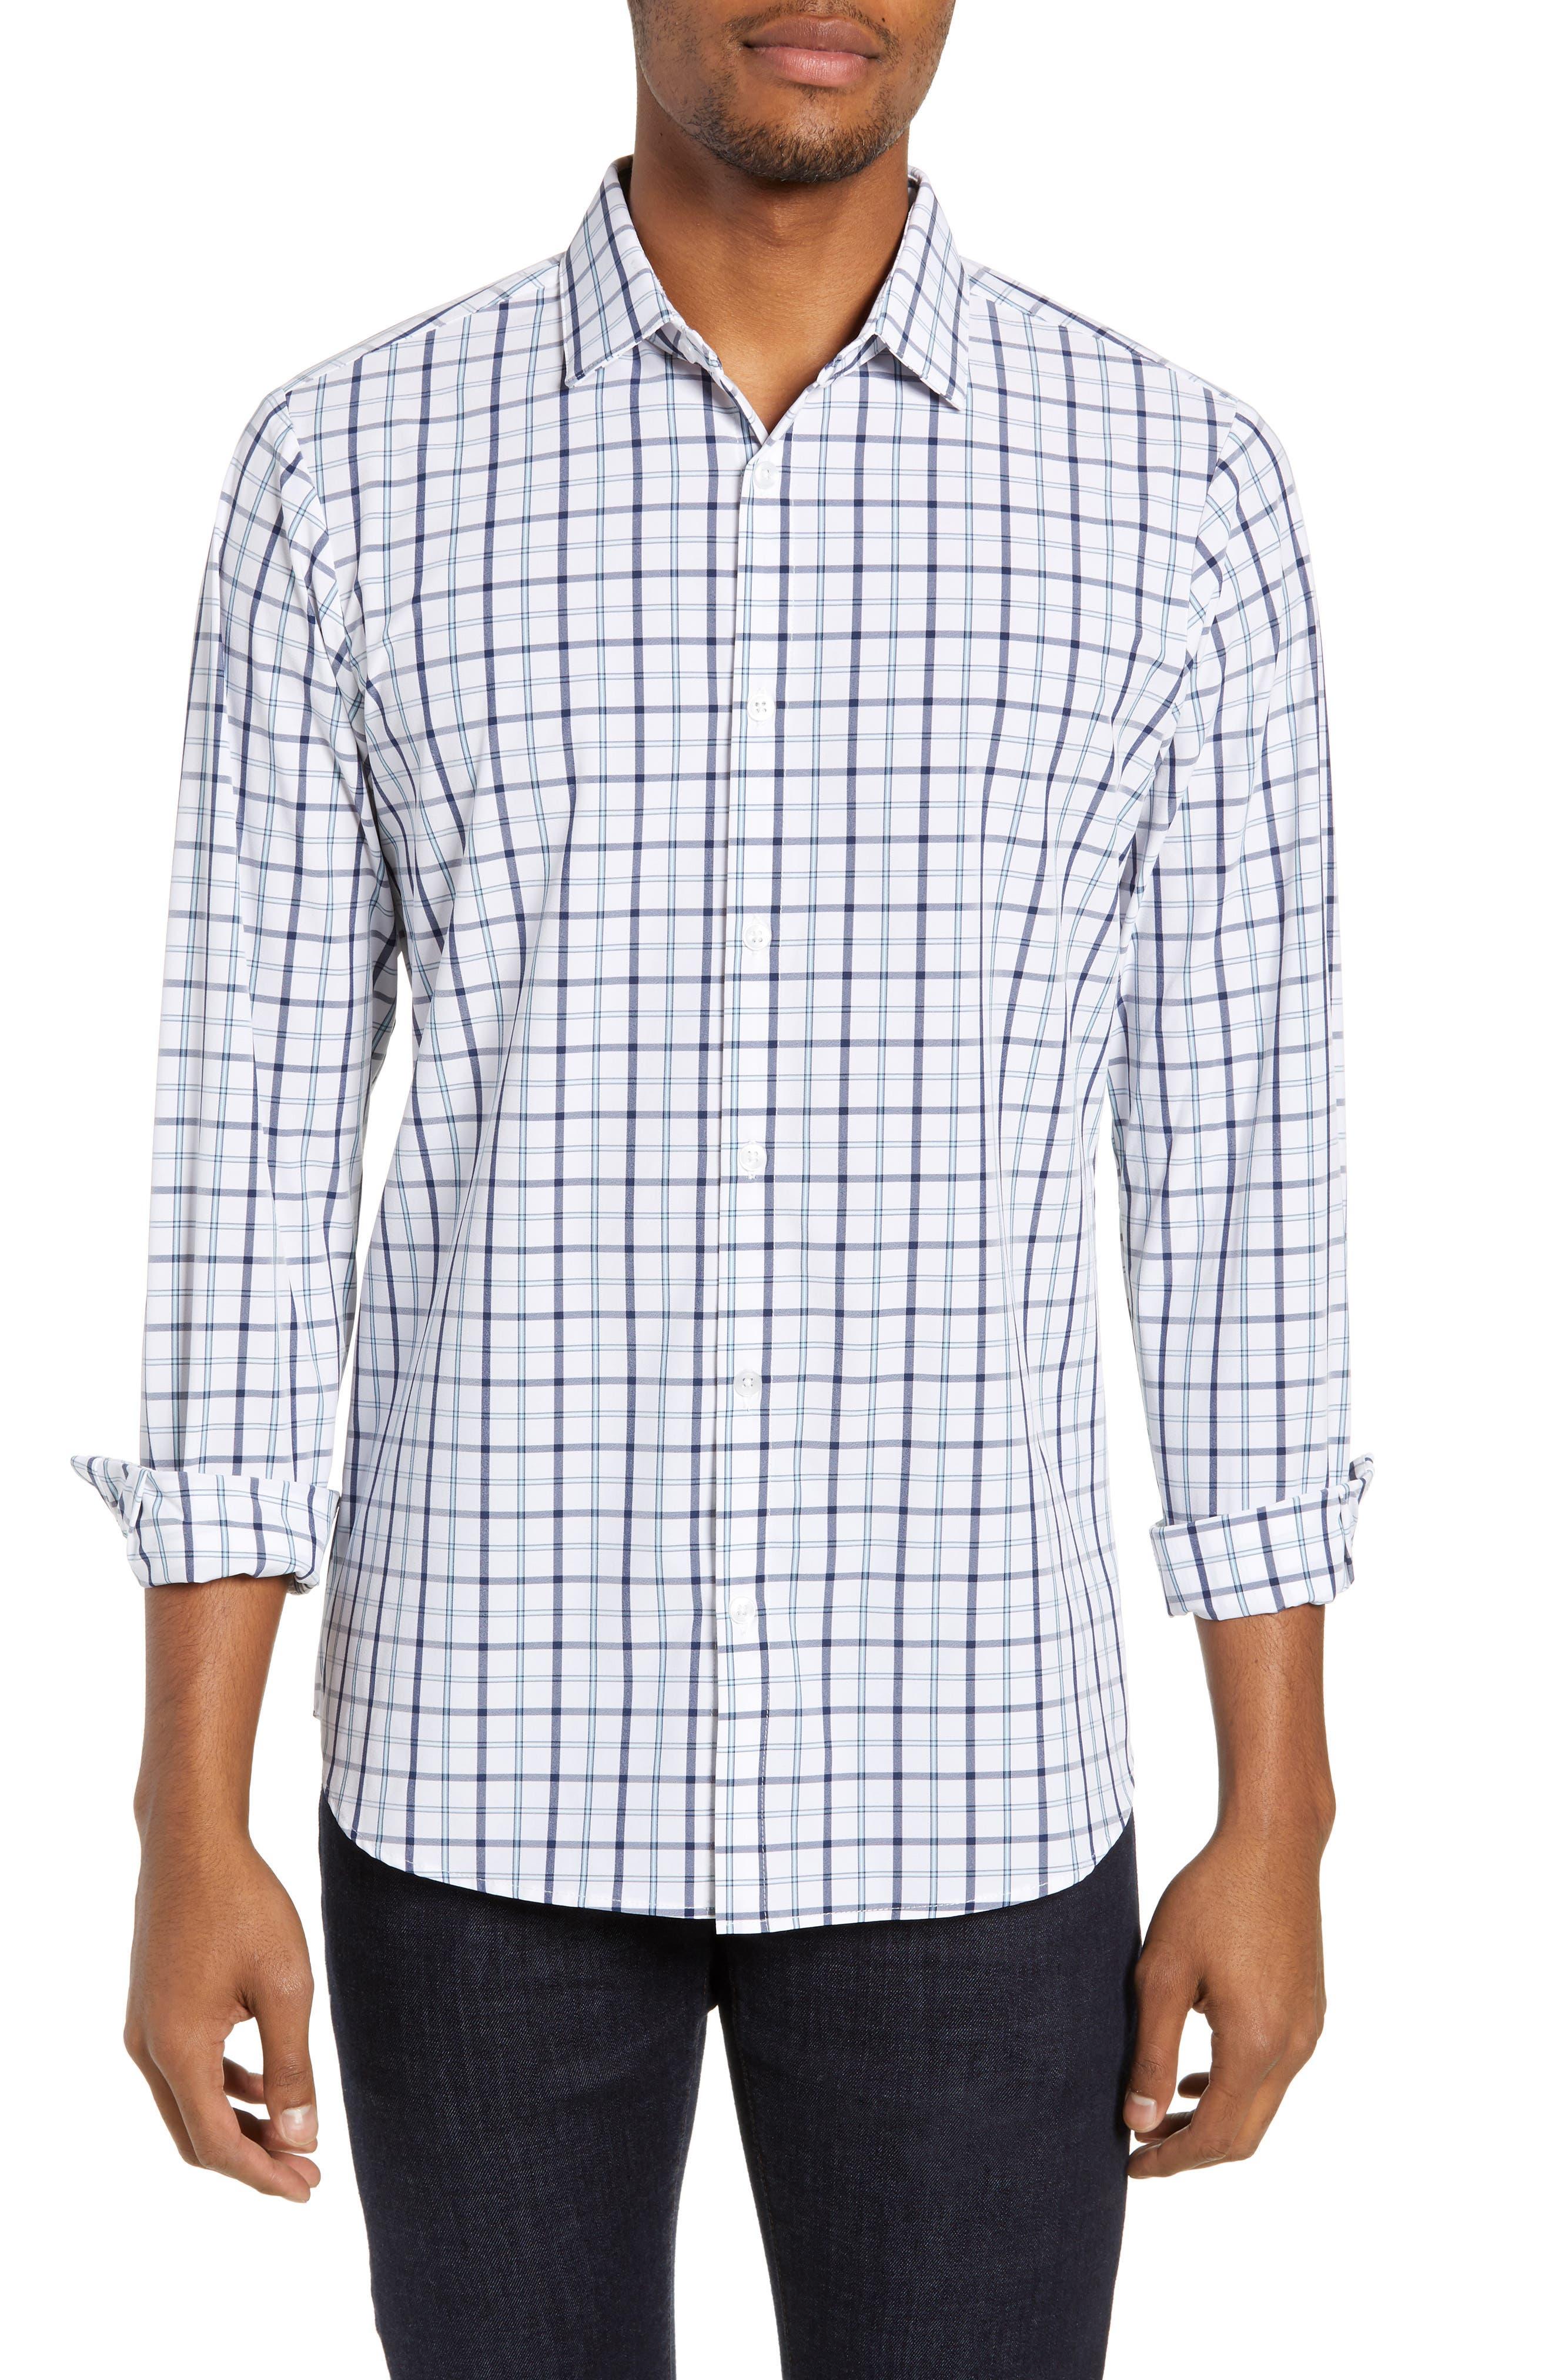 Bowers Regular Fit Check Performance Sport Shirt,                             Main thumbnail 1, color,                             NAVY